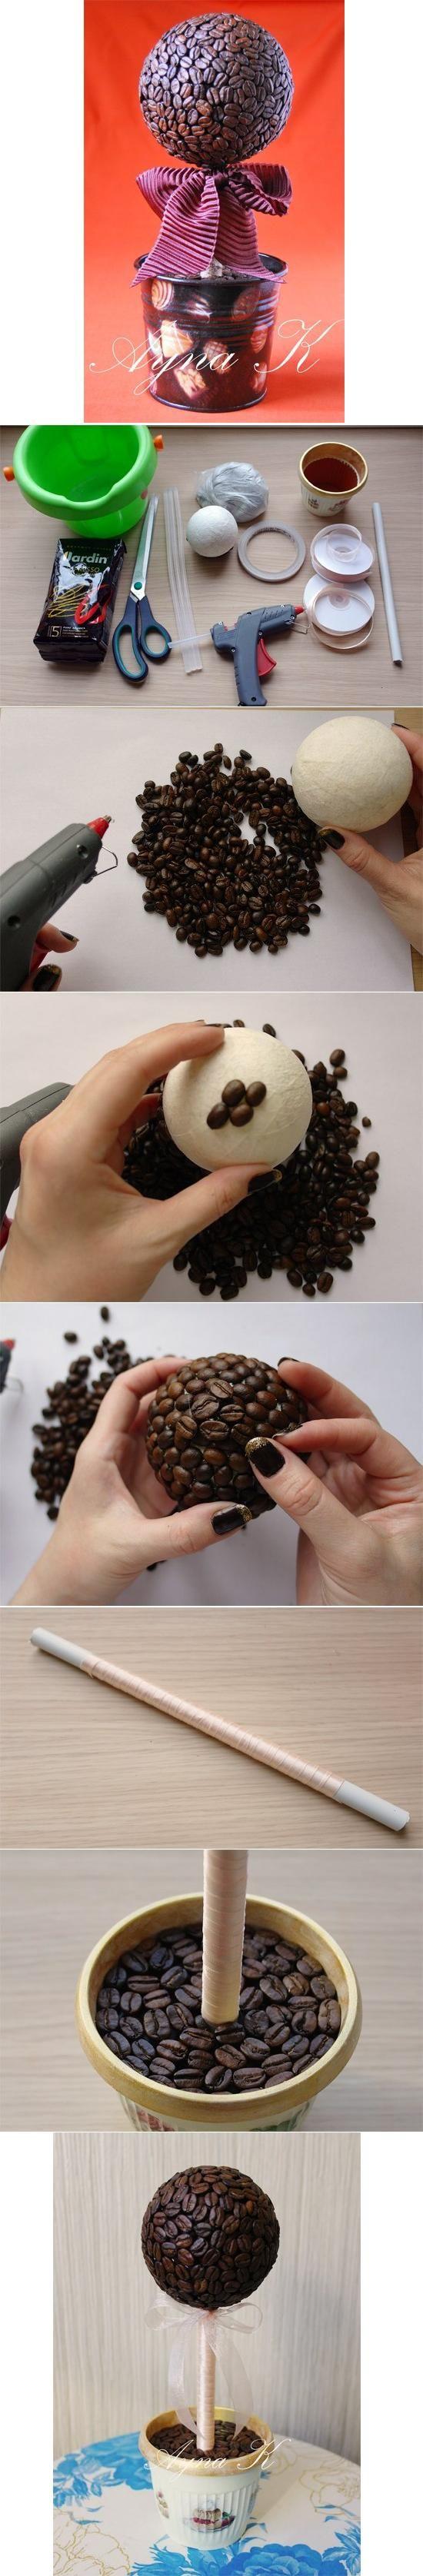 DIY Coffee Tree Ornament